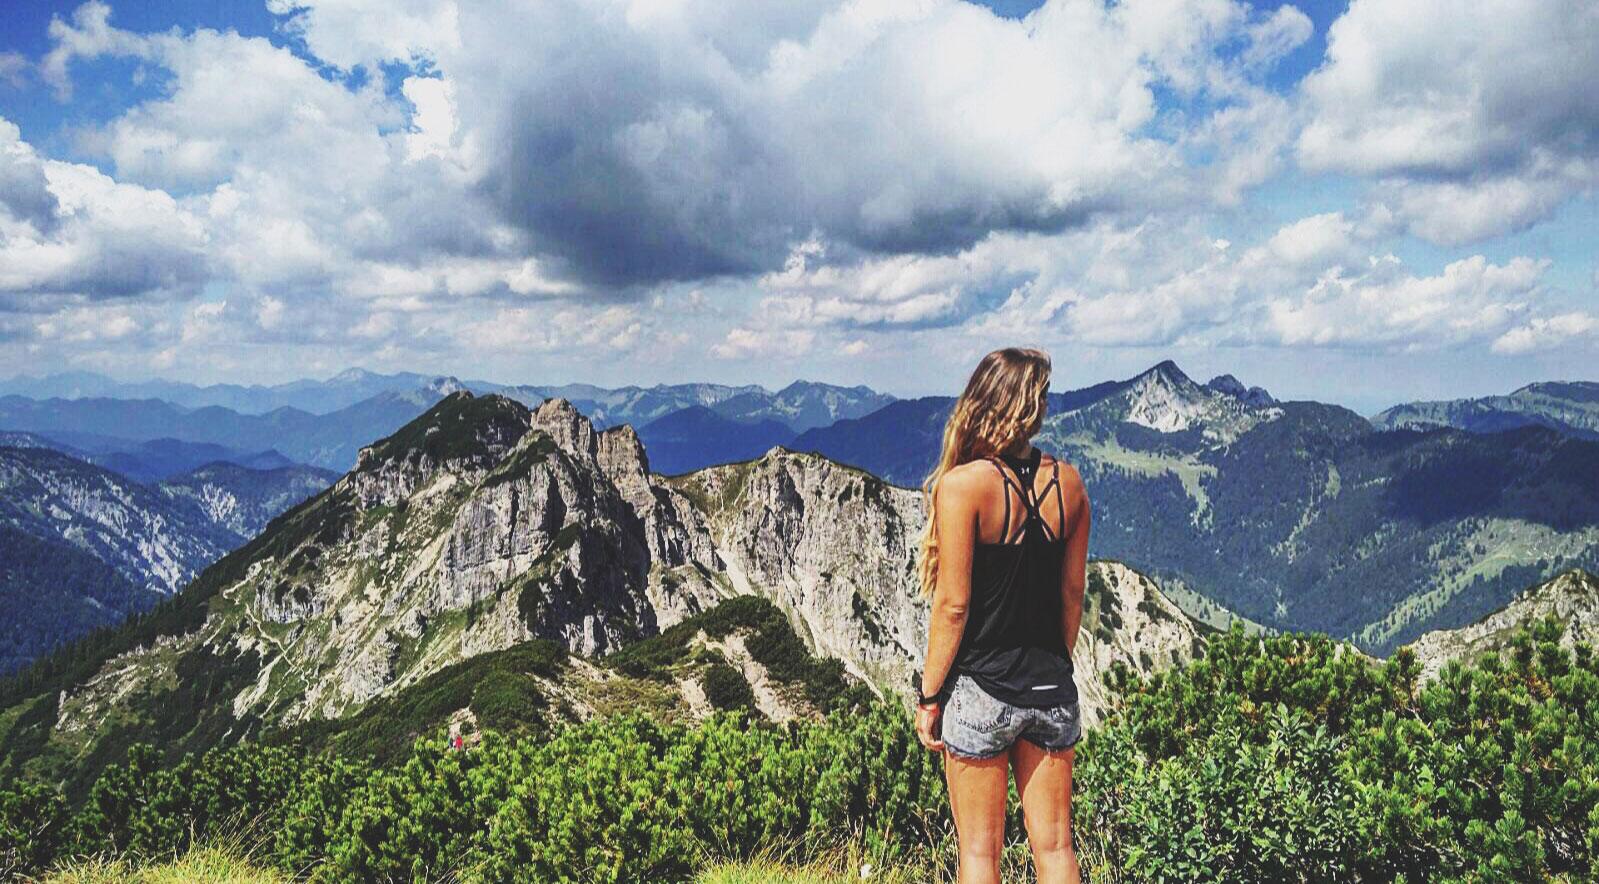 roxane-hillebrand-schinder-bergtour-wandertour-munichmountaingirls